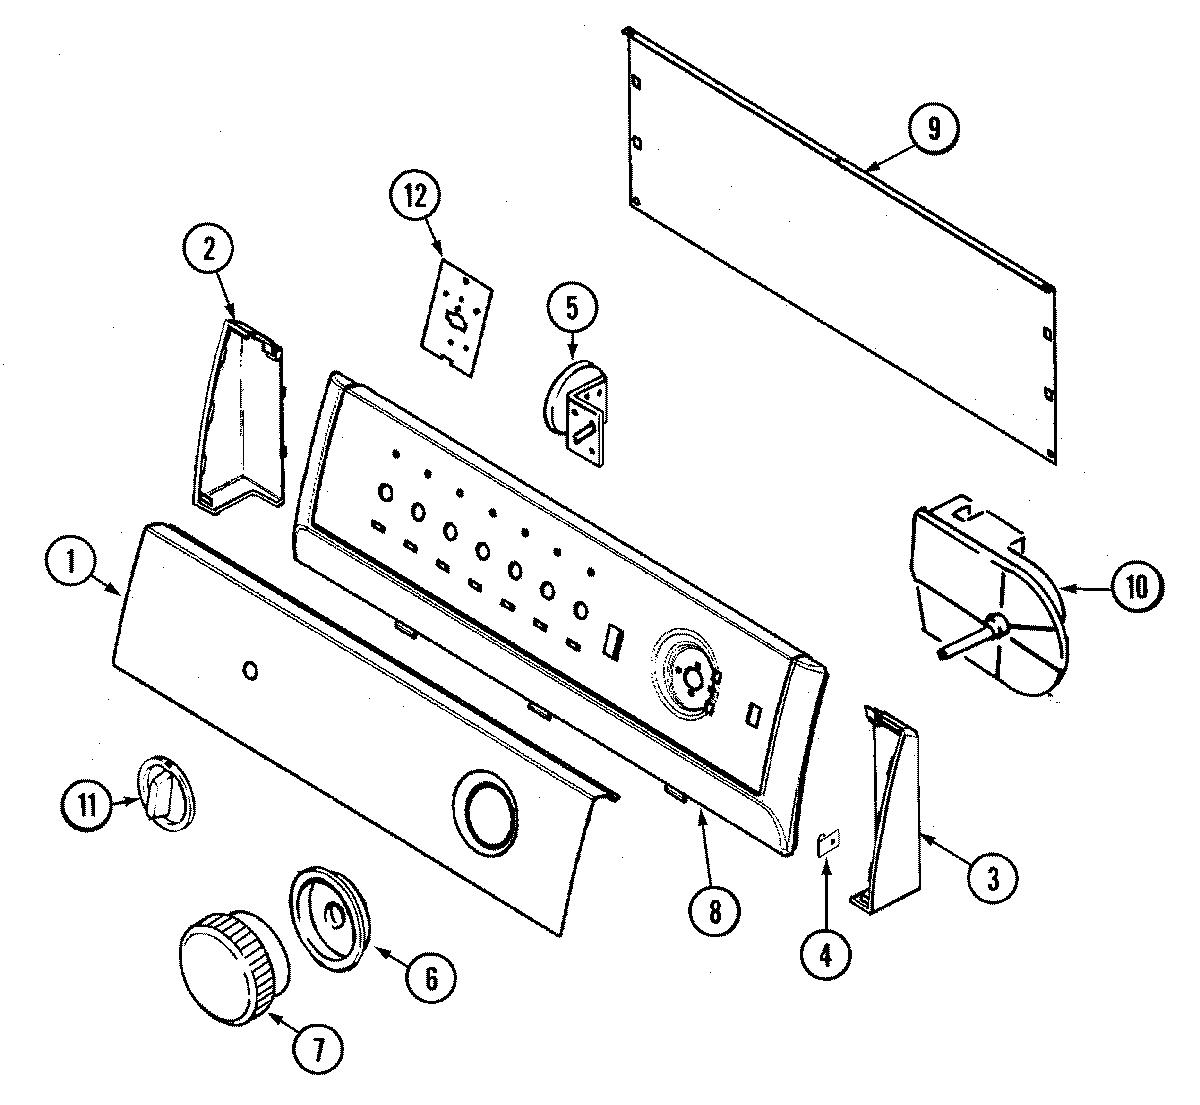 how to read washing machine wiring diagram admiral designer series washer motor    wiring       diagram    schematics  admiral designer series washer motor    wiring       diagram    schematics